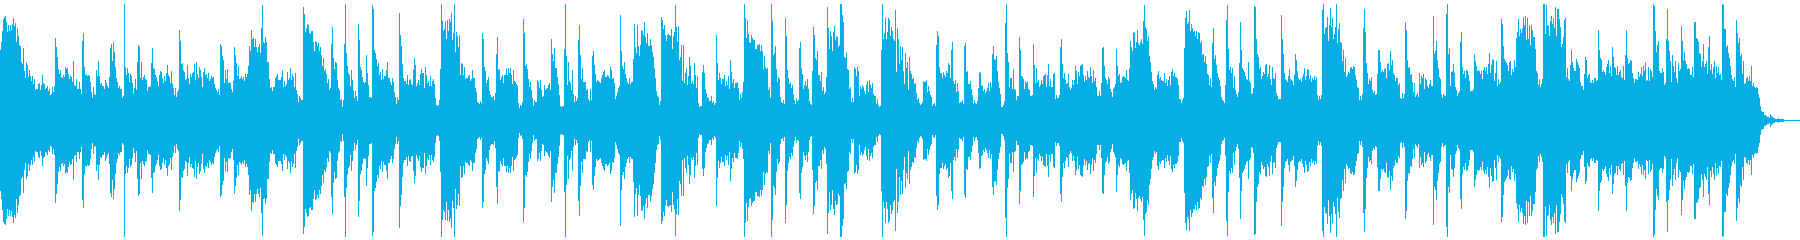 【CM】クールなエレクトロBGM・6の再生済みの波形